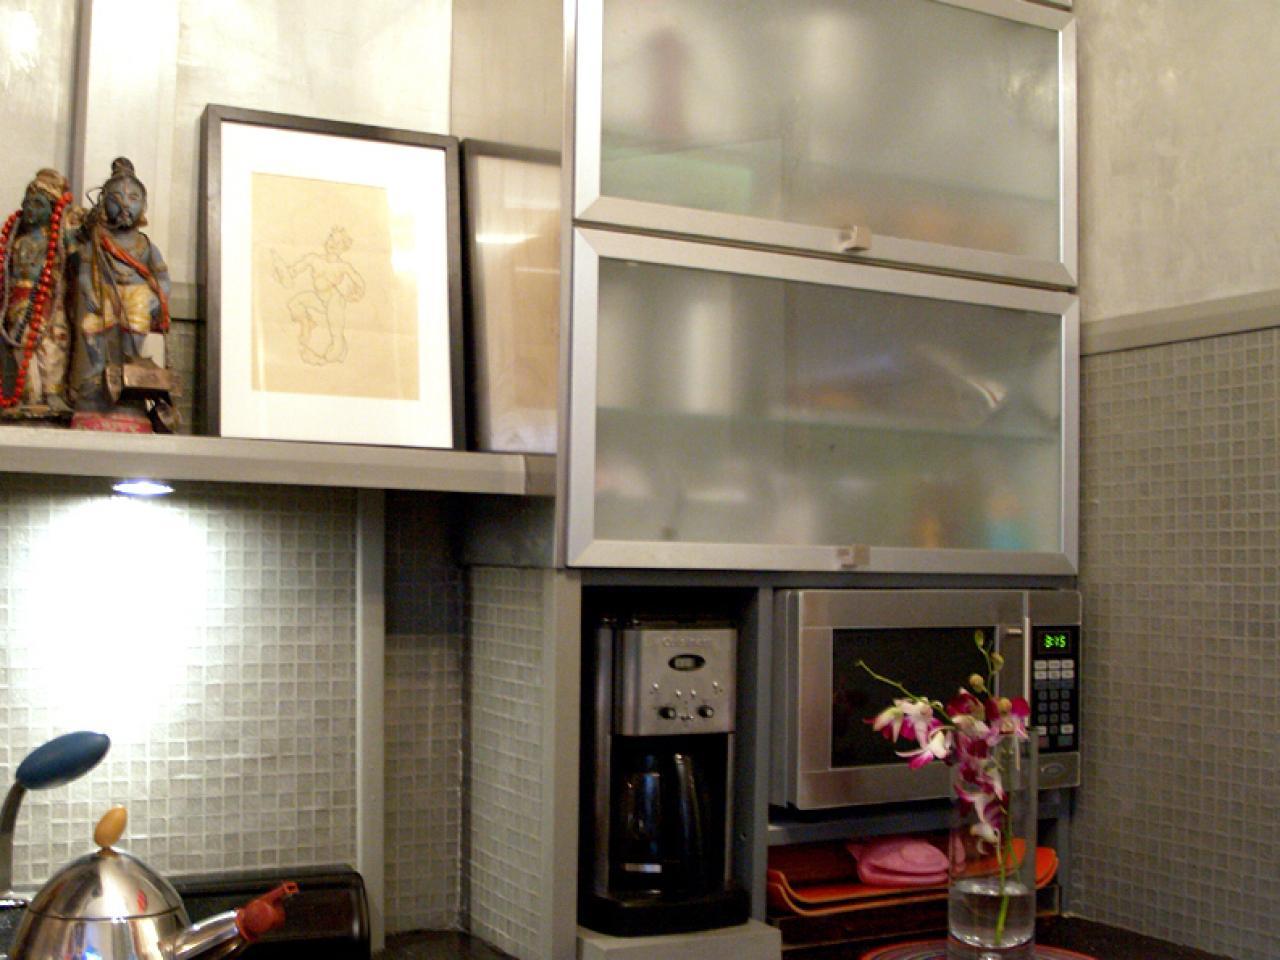 Do it yourself diy kitchen backsplash ideas hgtv pictures hgtv solutioingenieria Images